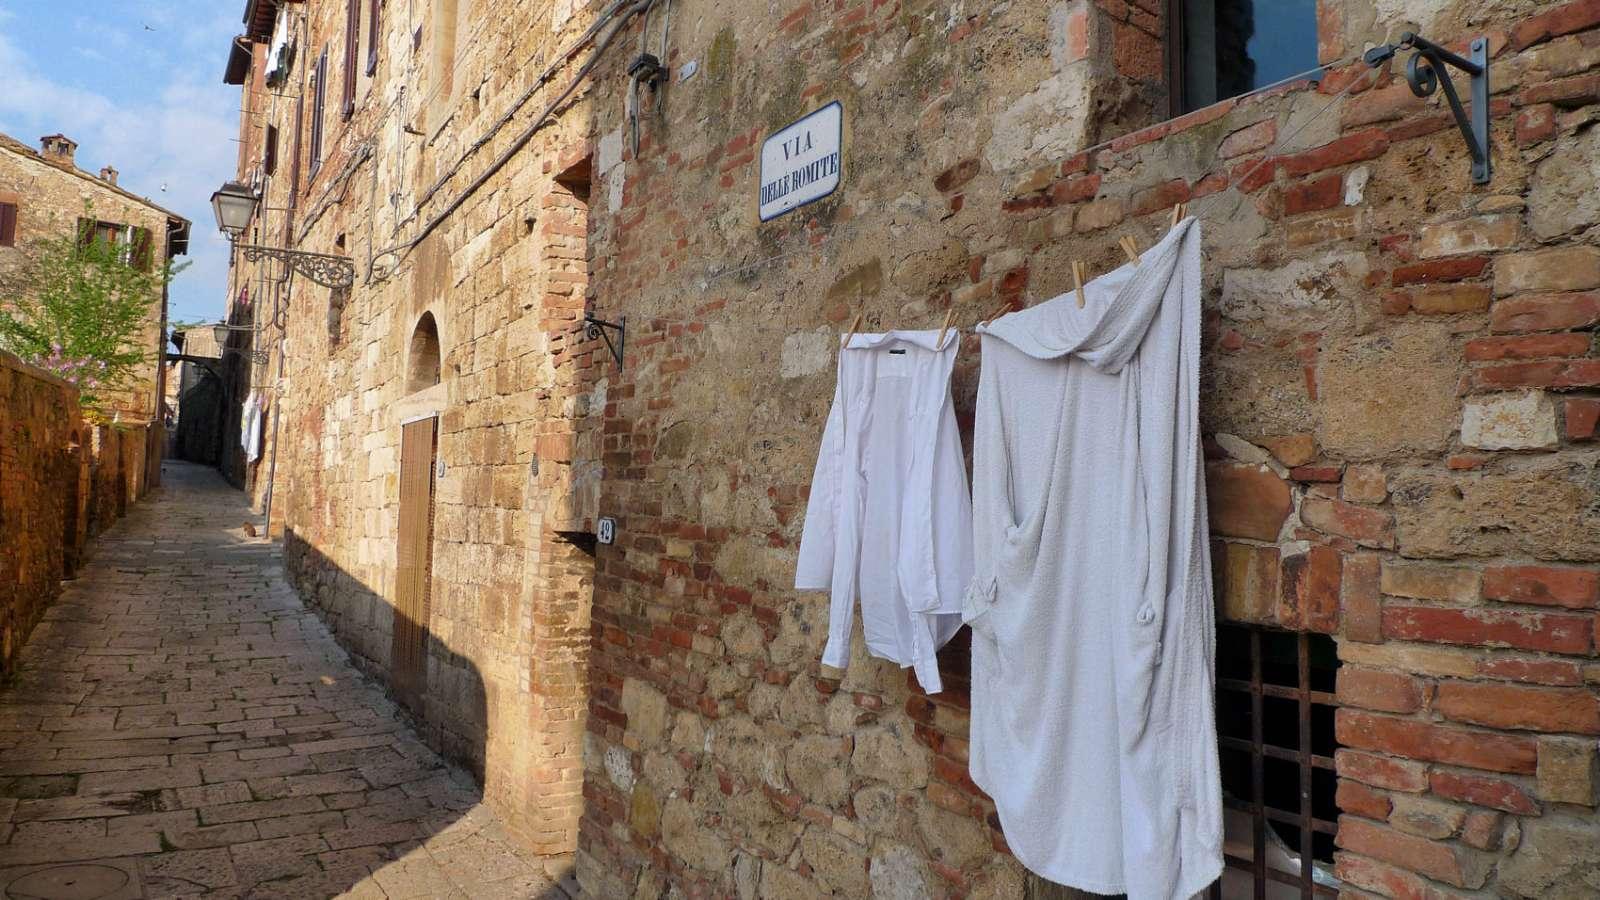 Via delle Romite in the high town